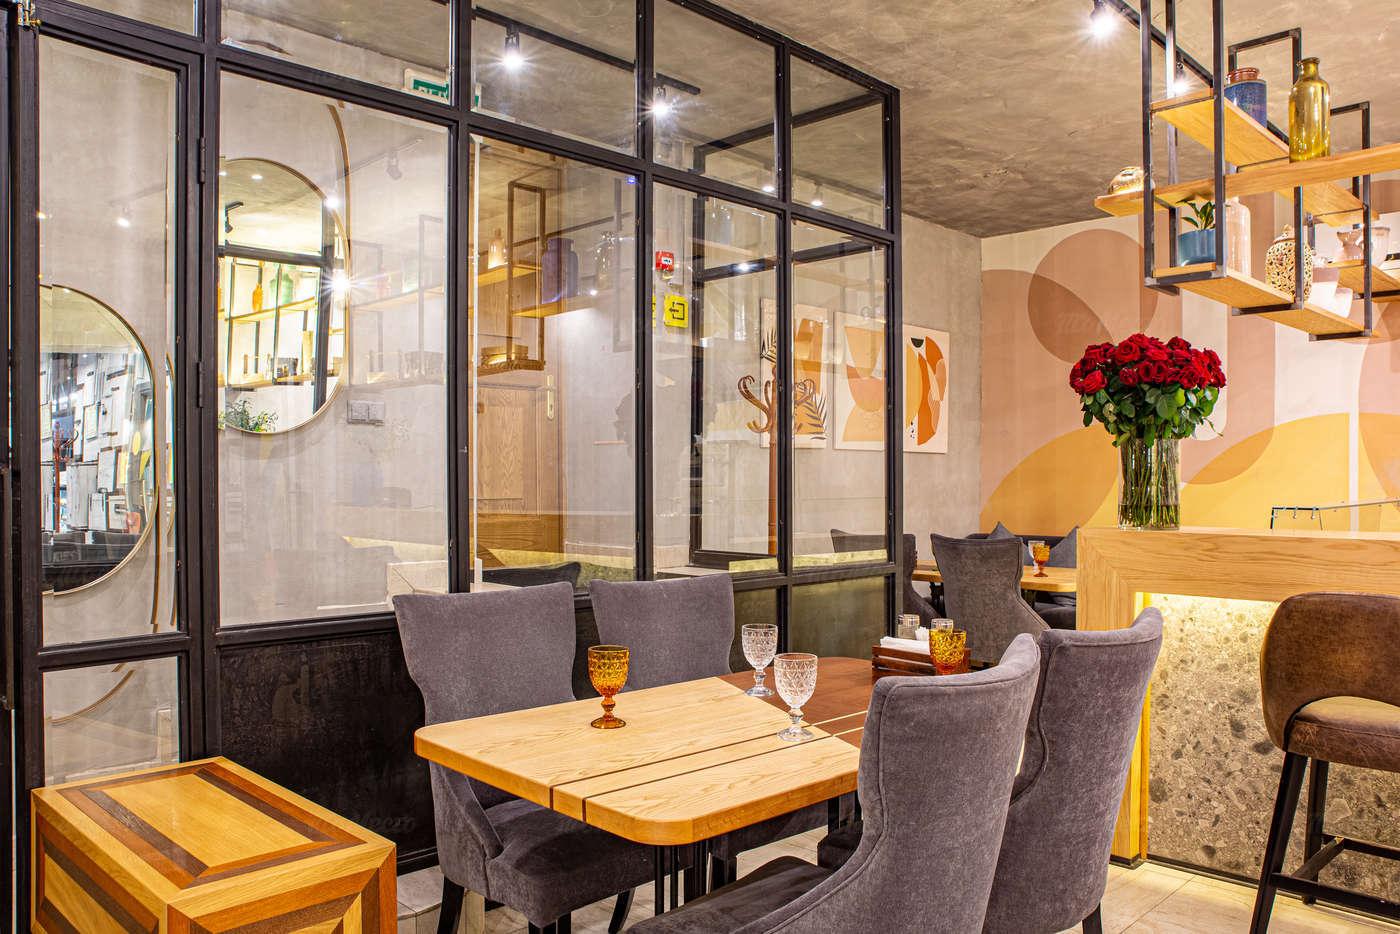 Ресторан IL LETTERATO (Литератор) в Петроверигском переулке фото 23